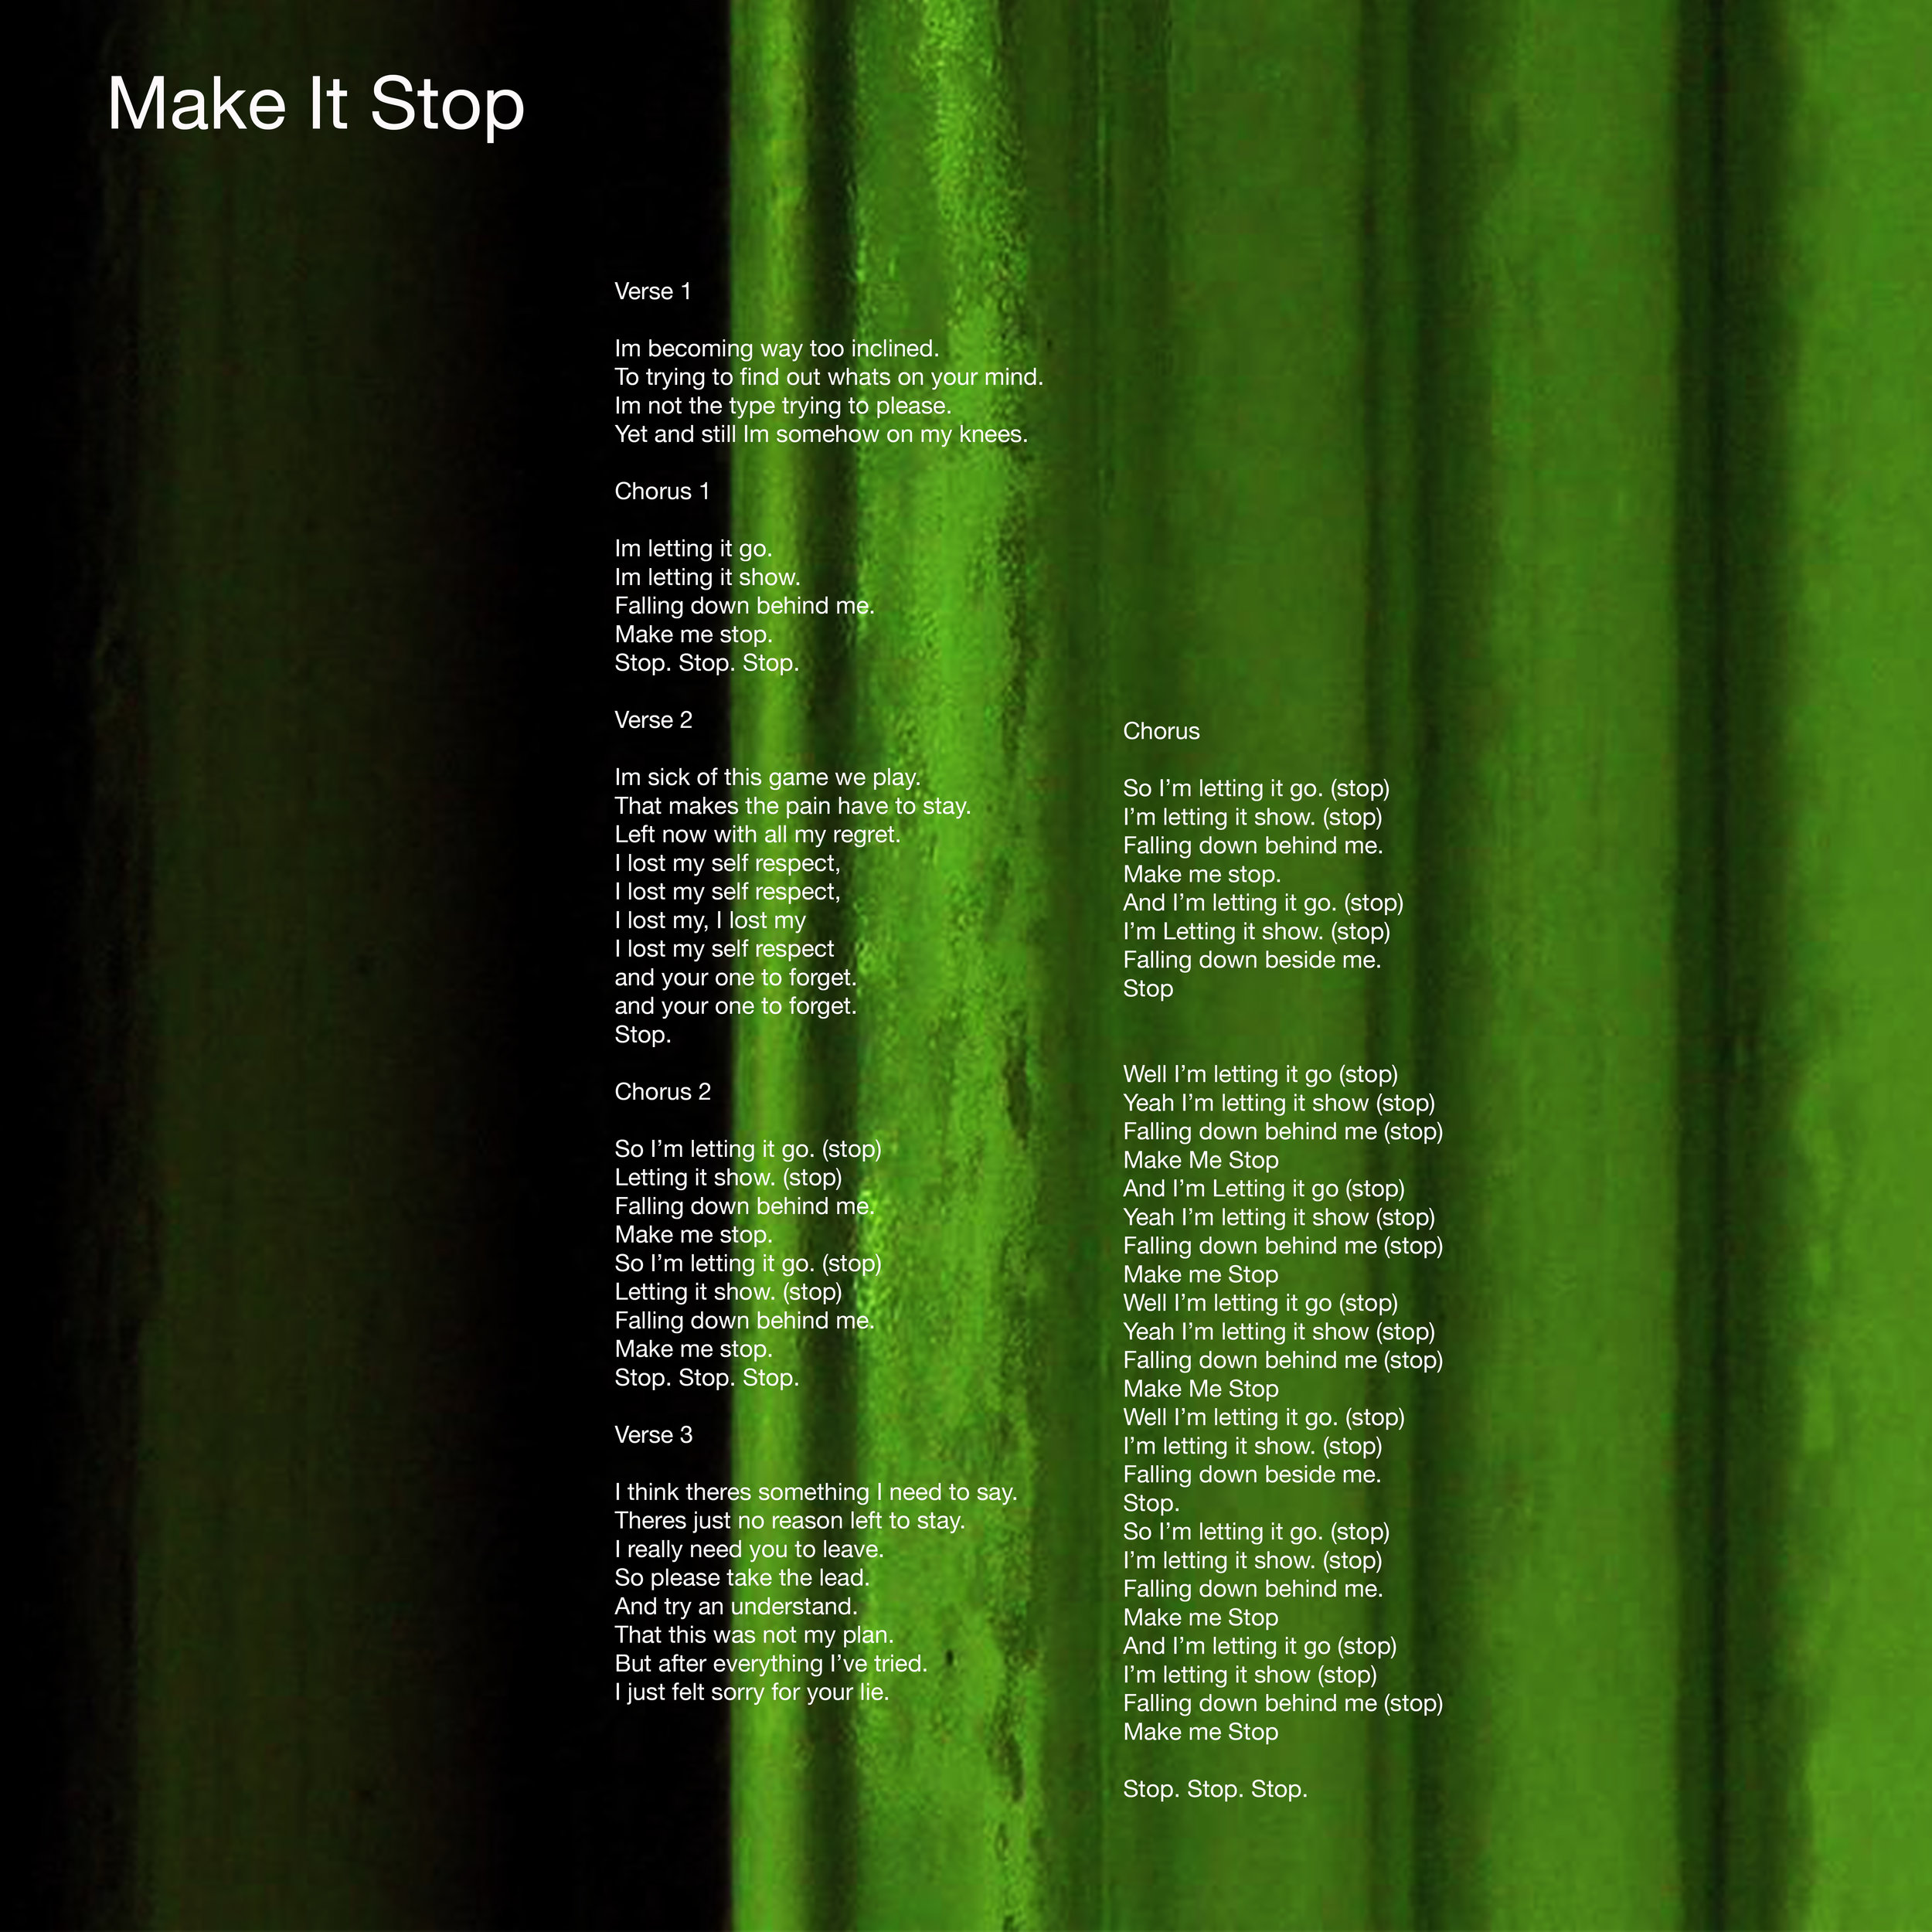 MakeitStopMTheoryLyricArtDLX.jpg